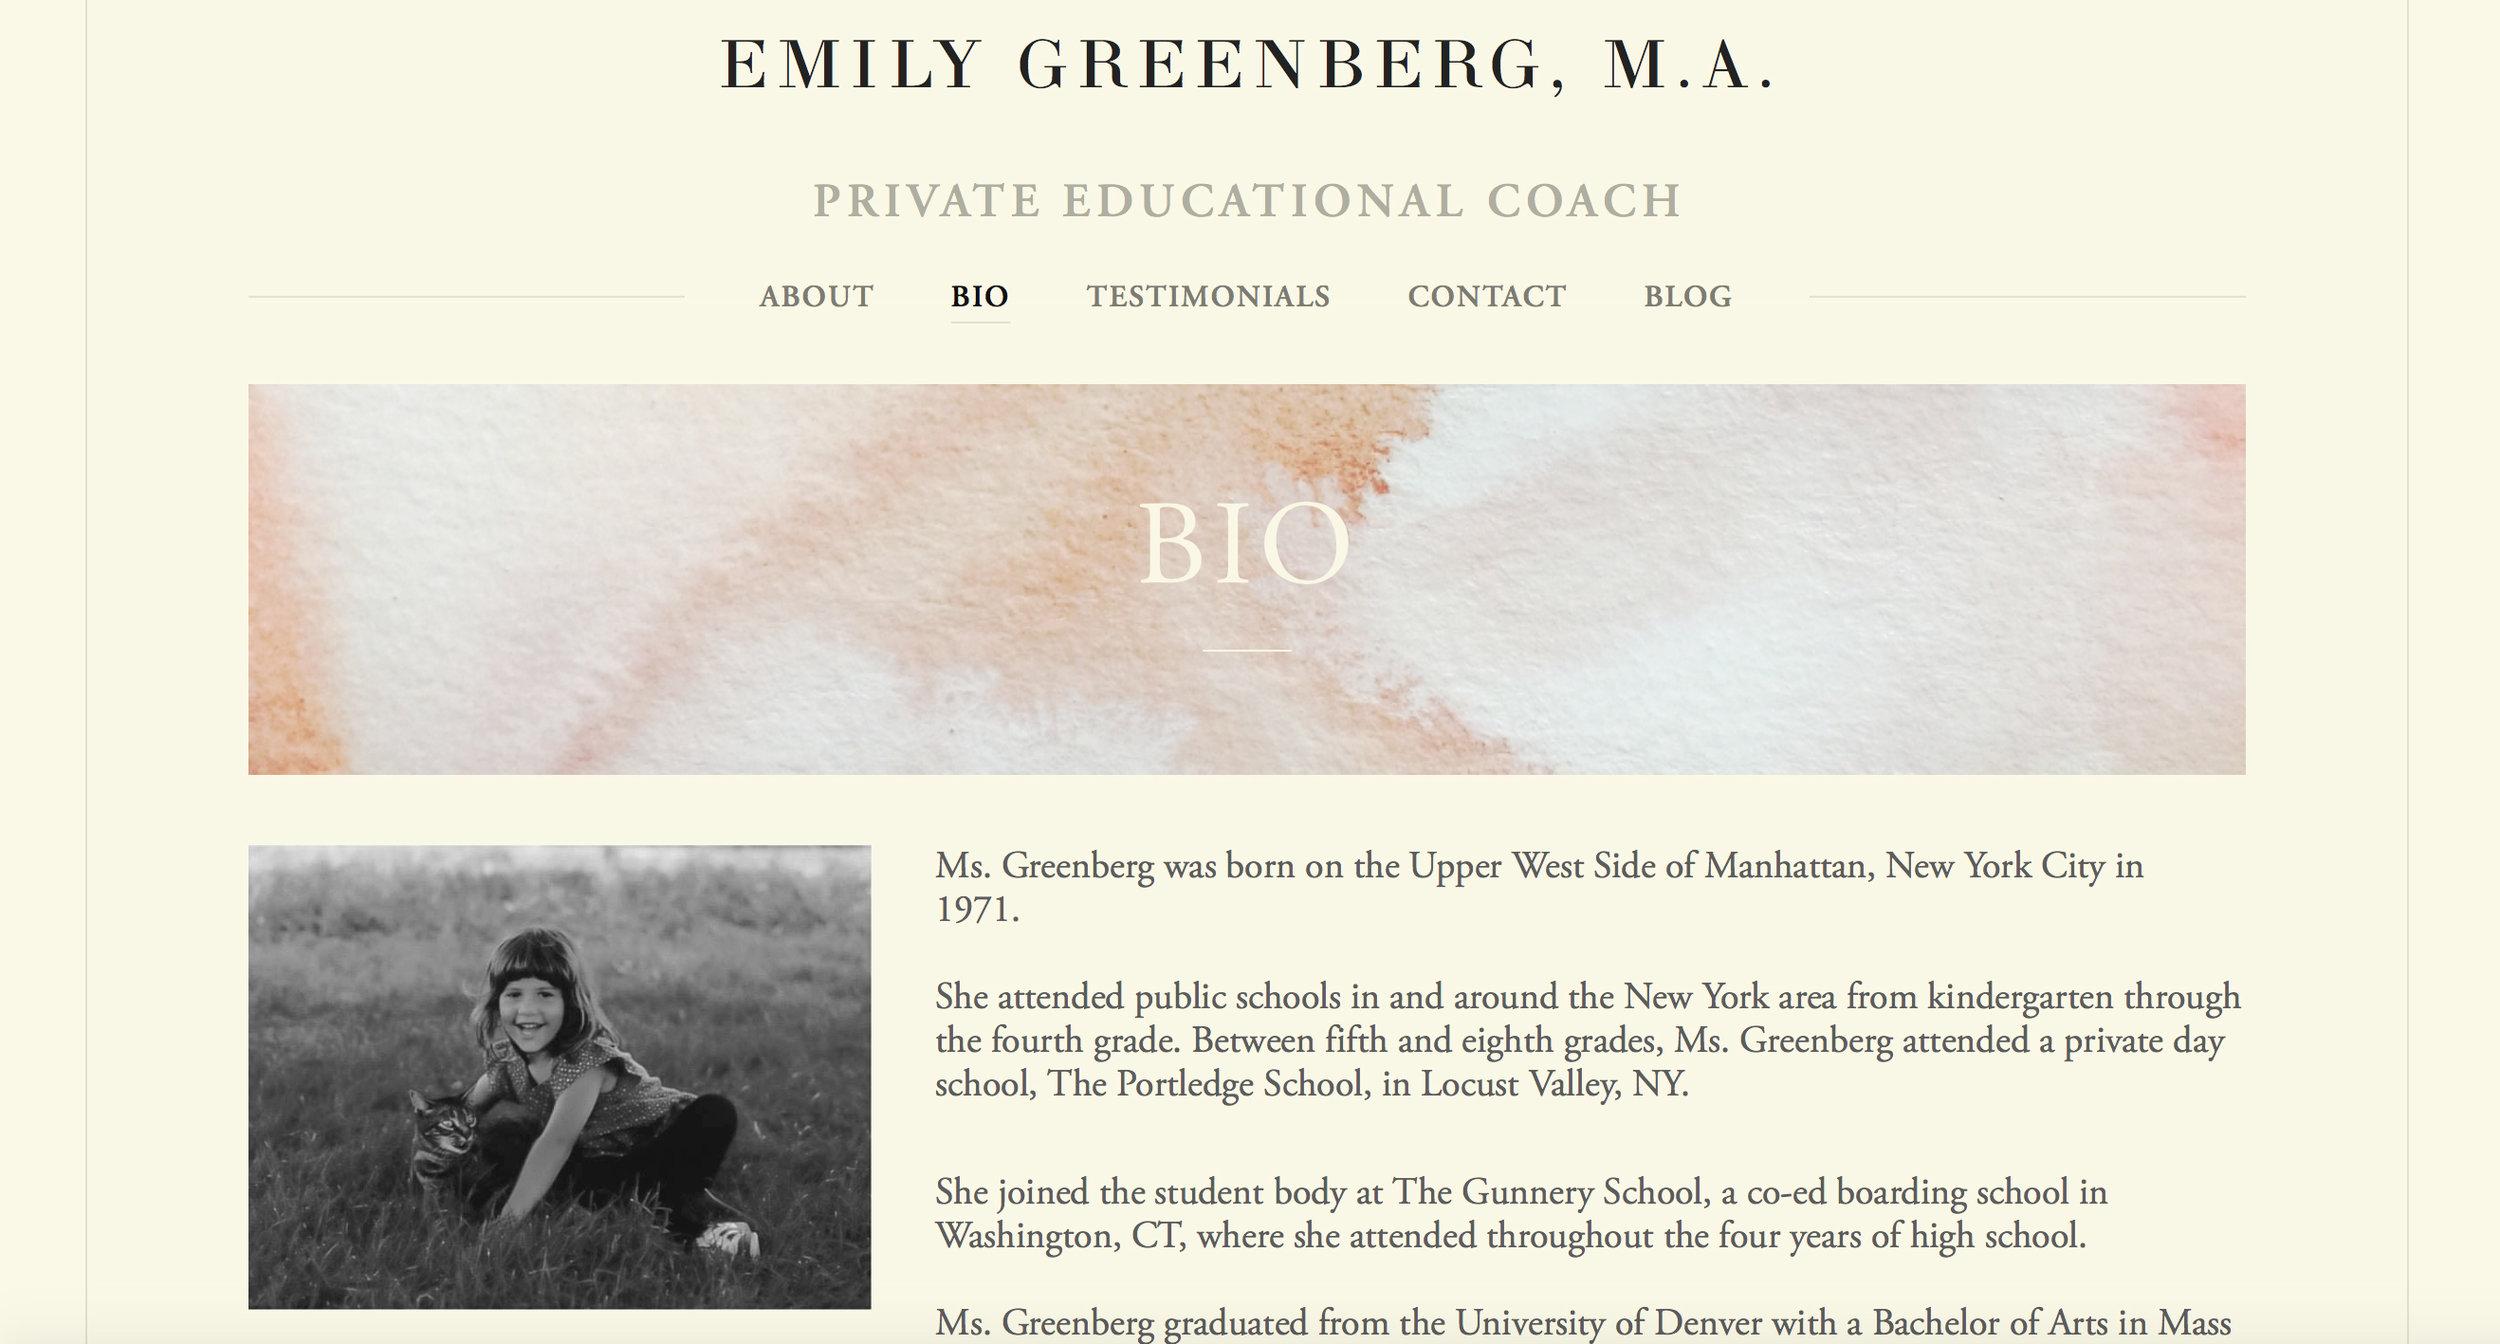 Emily Greenberg Website |  www.emily-greenberg.com